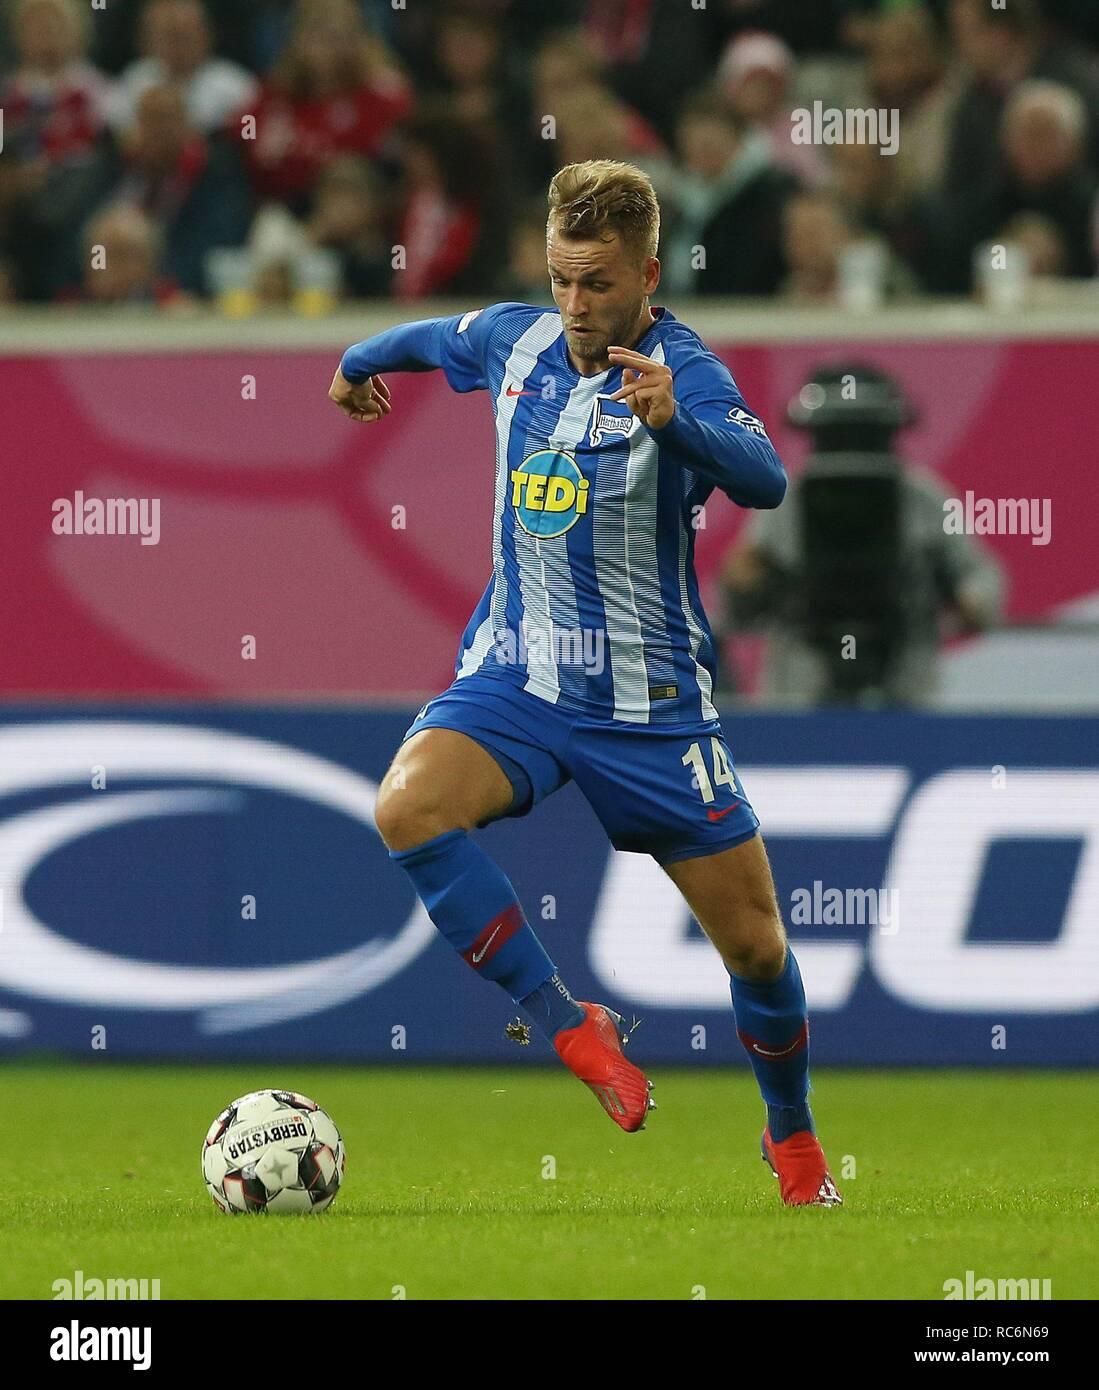 firo: 13.01.2019, football, 1.Bundesliga, season 2018/2019, Telekom-Cup 2019, Hertha BSC Berlin, Pascal KOPKE,   usage worldwide - Stock Image